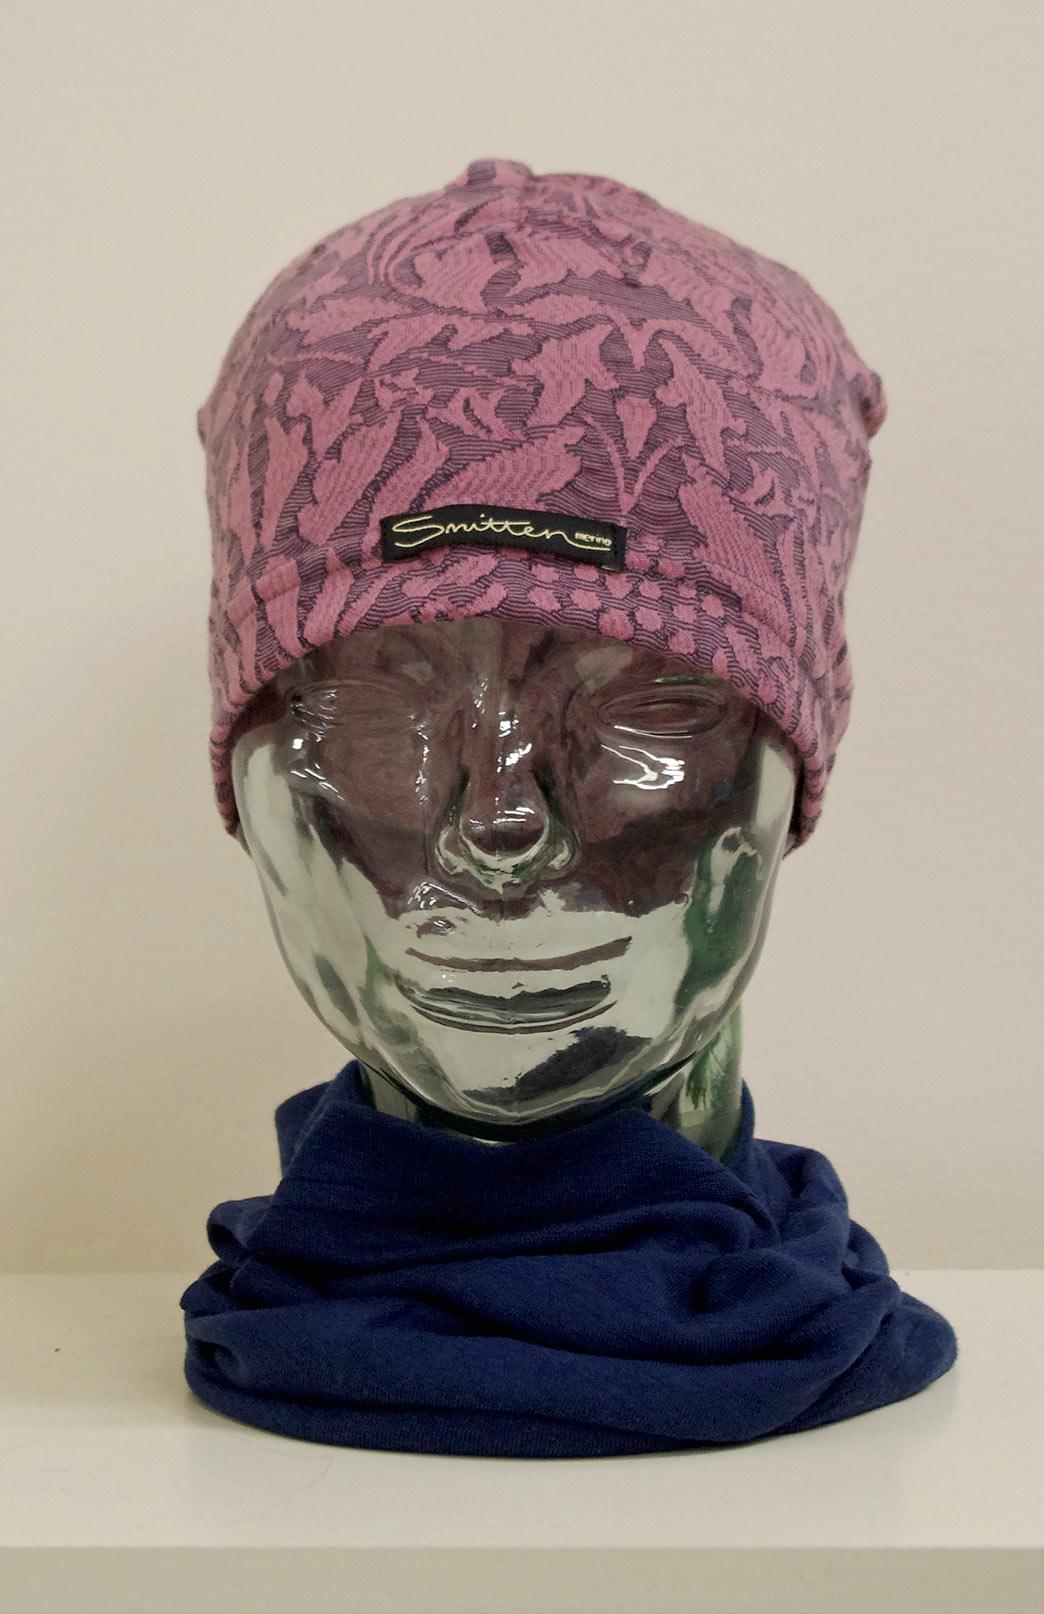 Beanie -- Patterned - Pink Abbey Floral Patterned Merino Wool Unisex Beanie - Smitten Merino Tasmania Australia